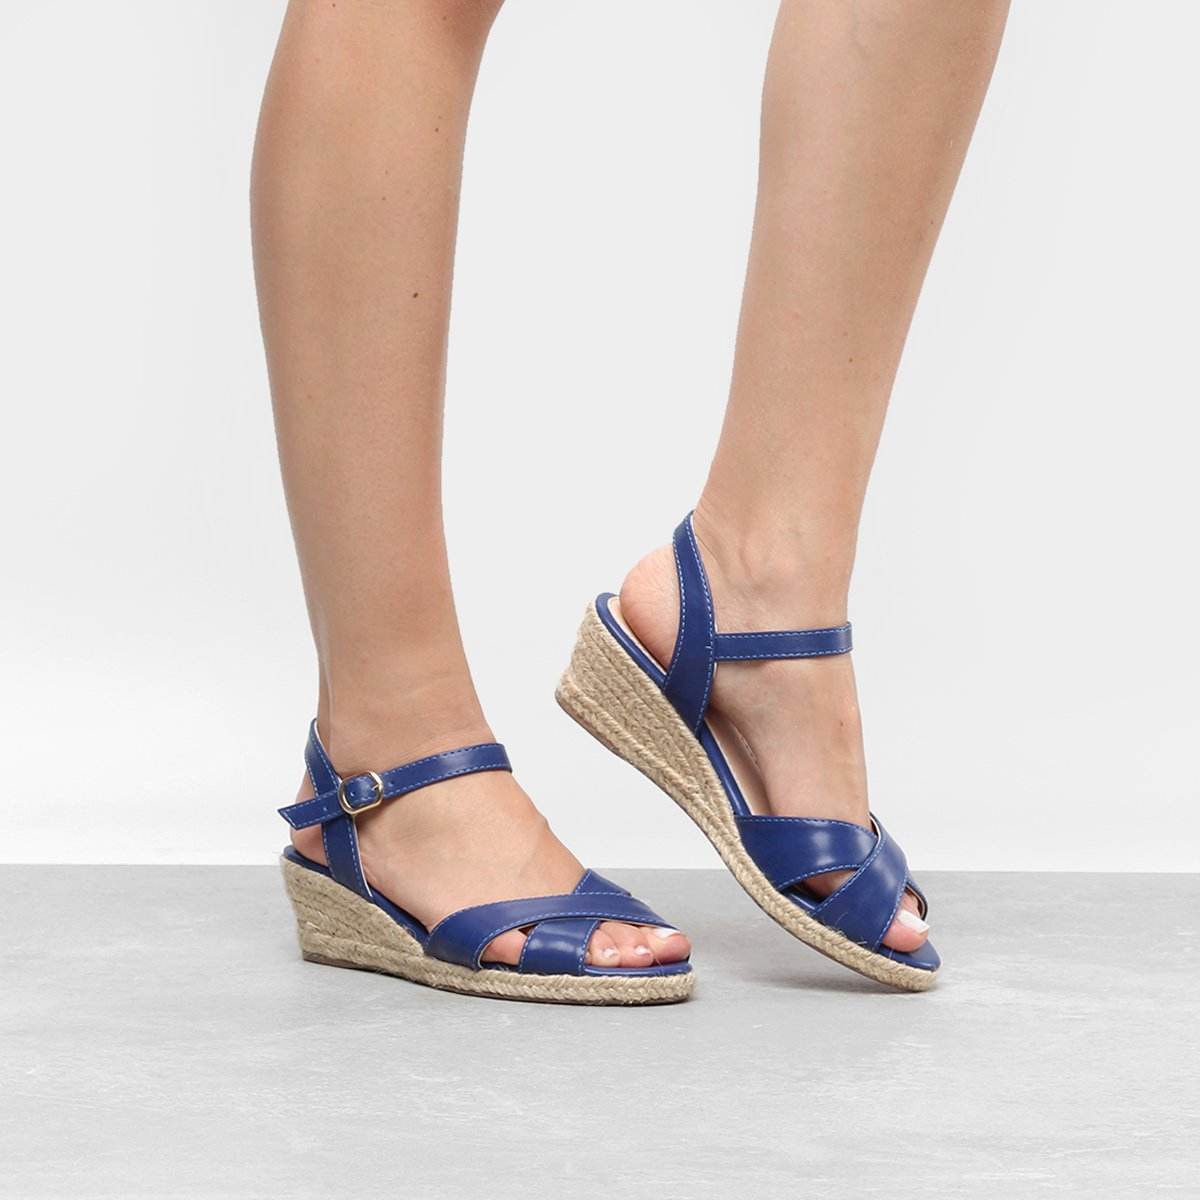 66aff46247 Sandália Anabela Shoestock Corda Feminina   Shoestock